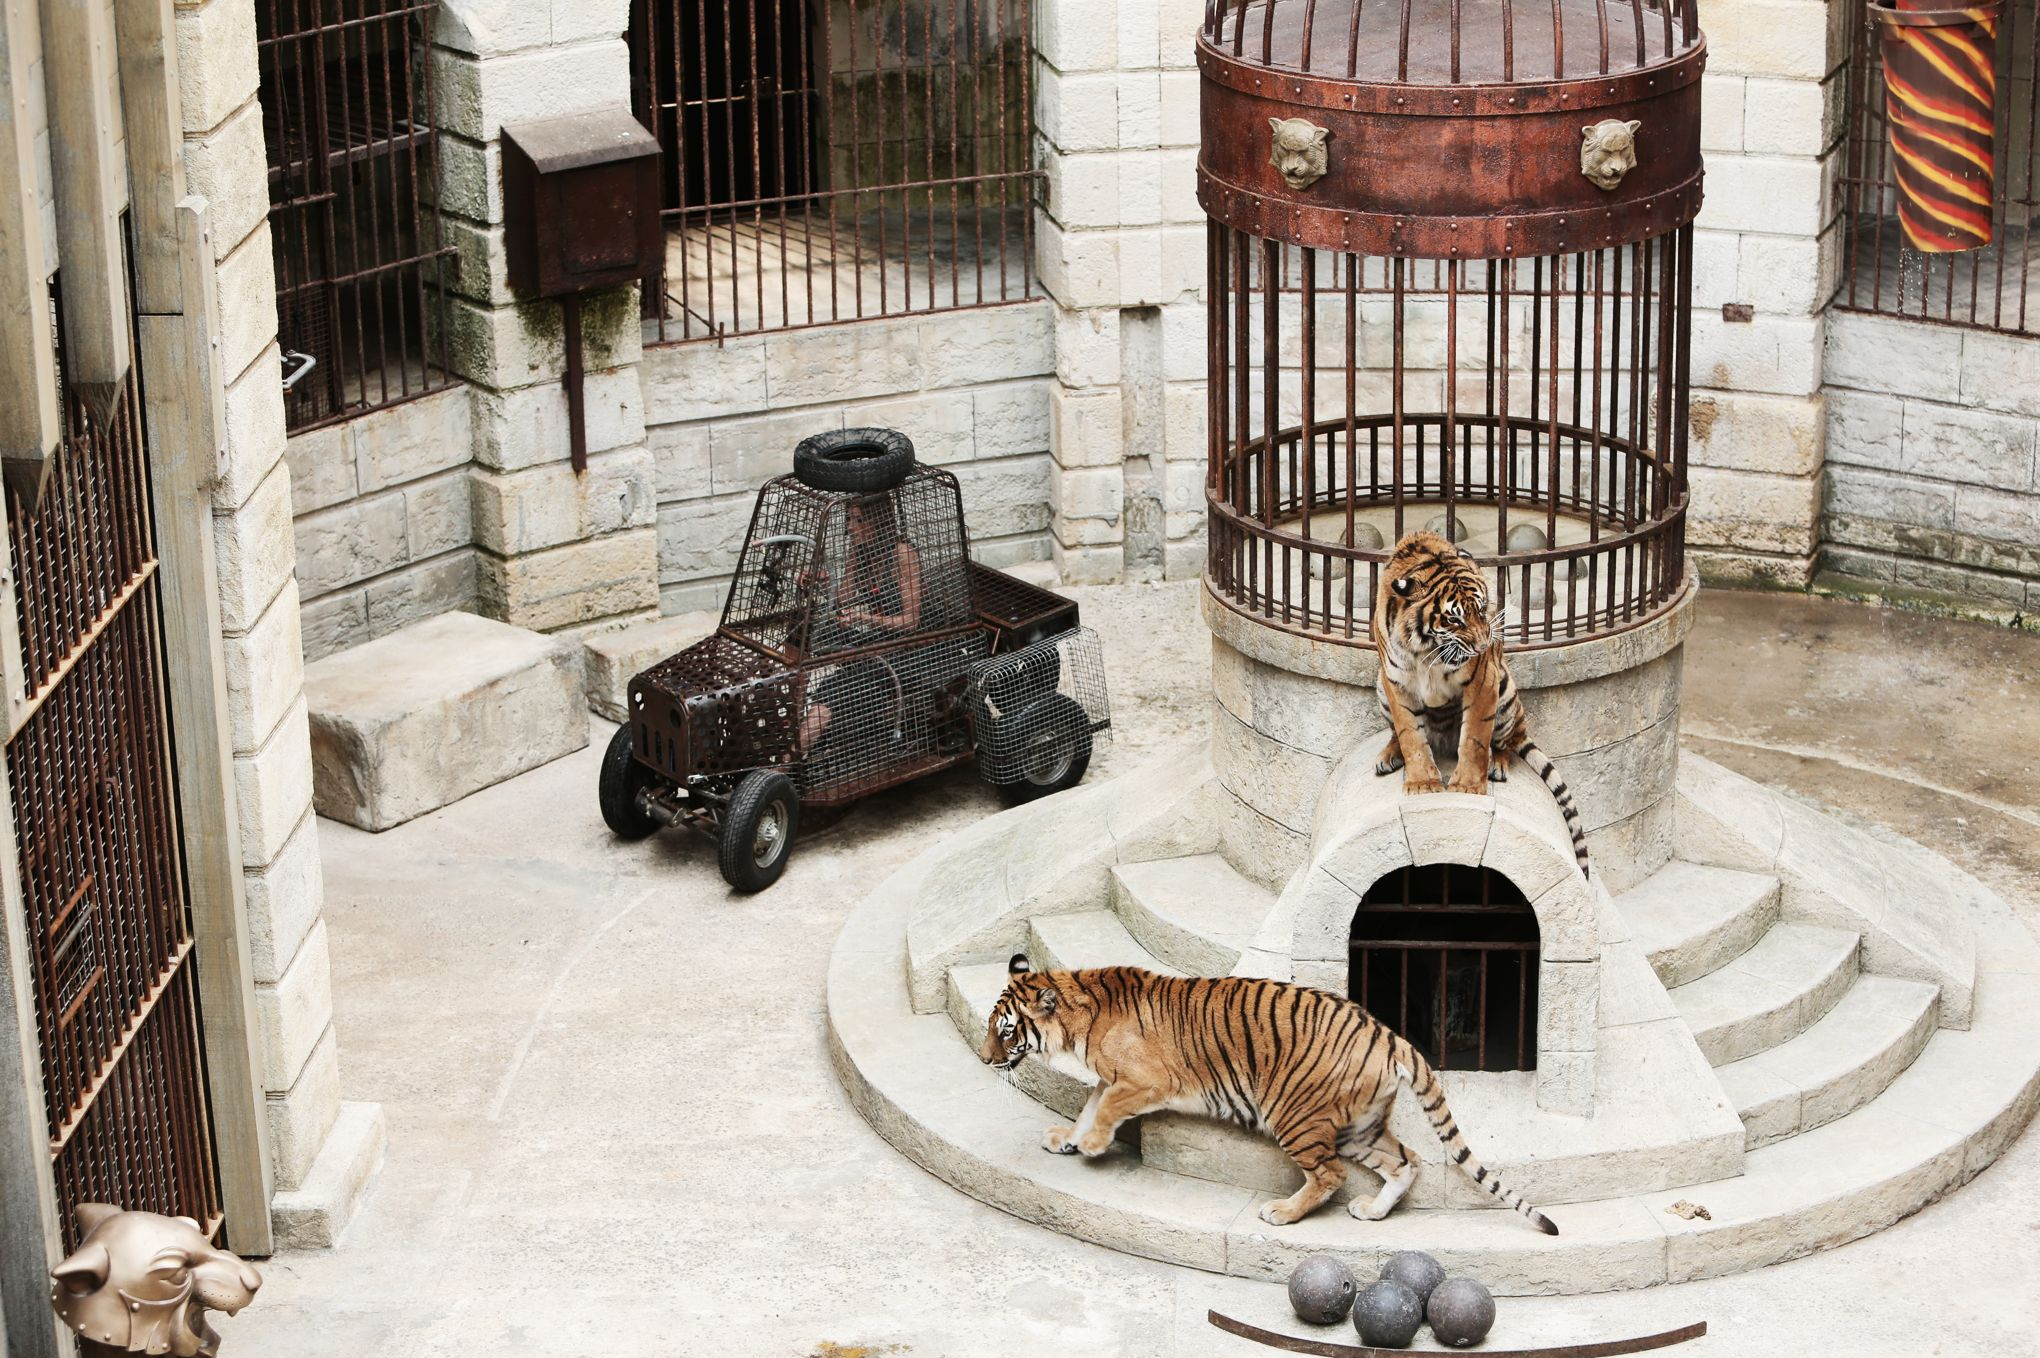 Fort Boyard Tigres Serpents Araignées L Incroyable Logistique